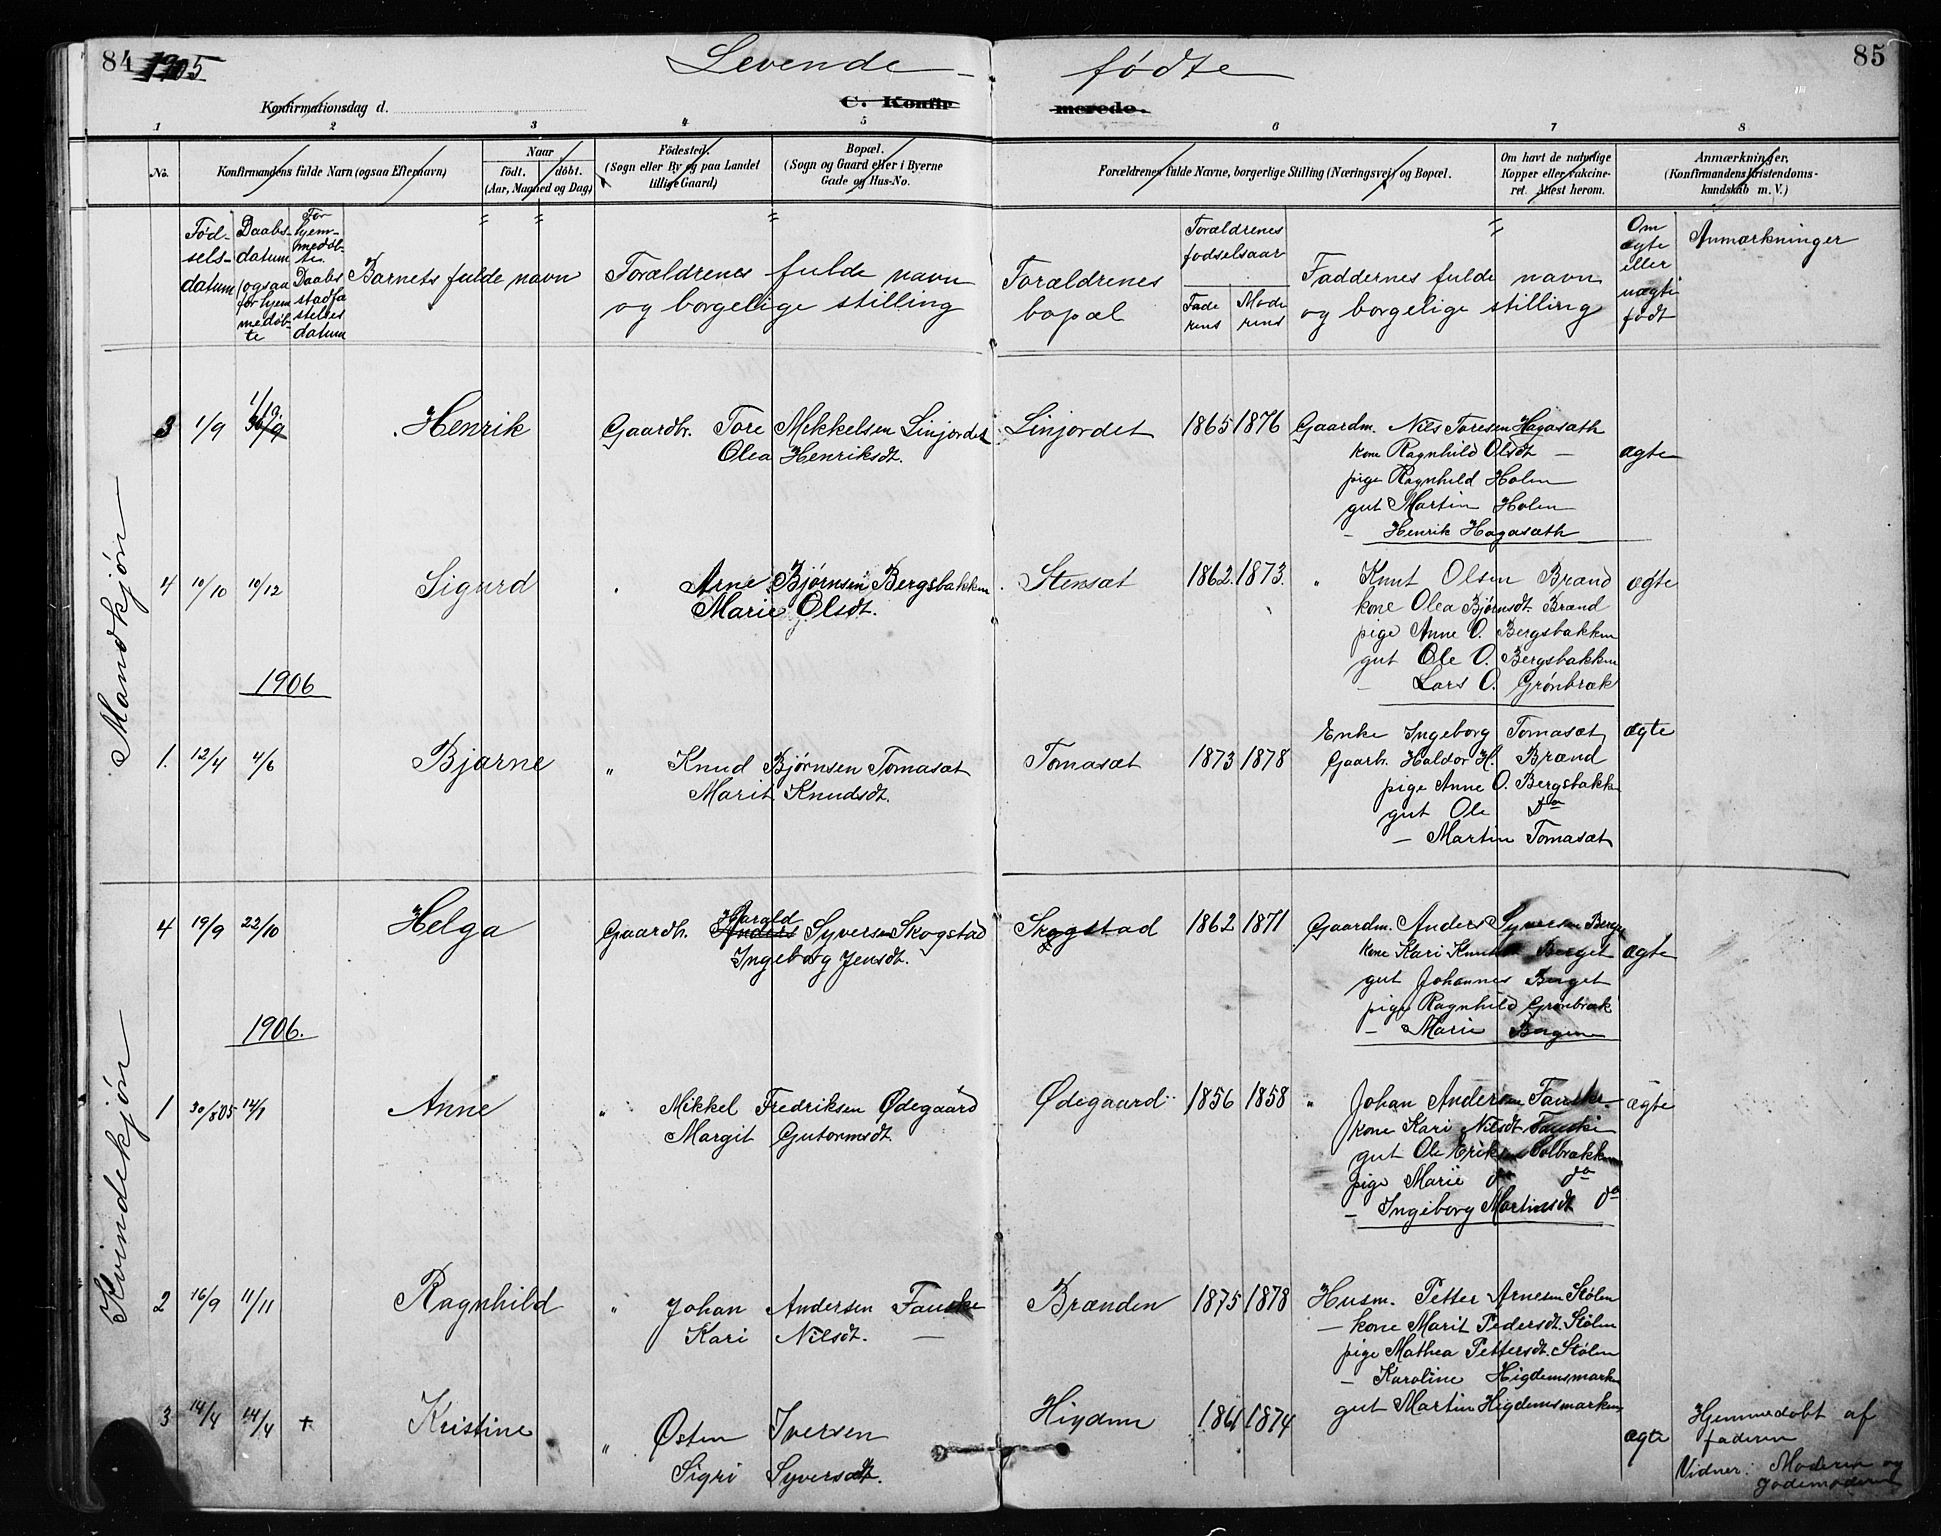 SAH, Etnedal prestekontor, H/Ha/Hab/Habb/L0001: Klokkerbok nr. II 1, 1894-1911, s. 84-85